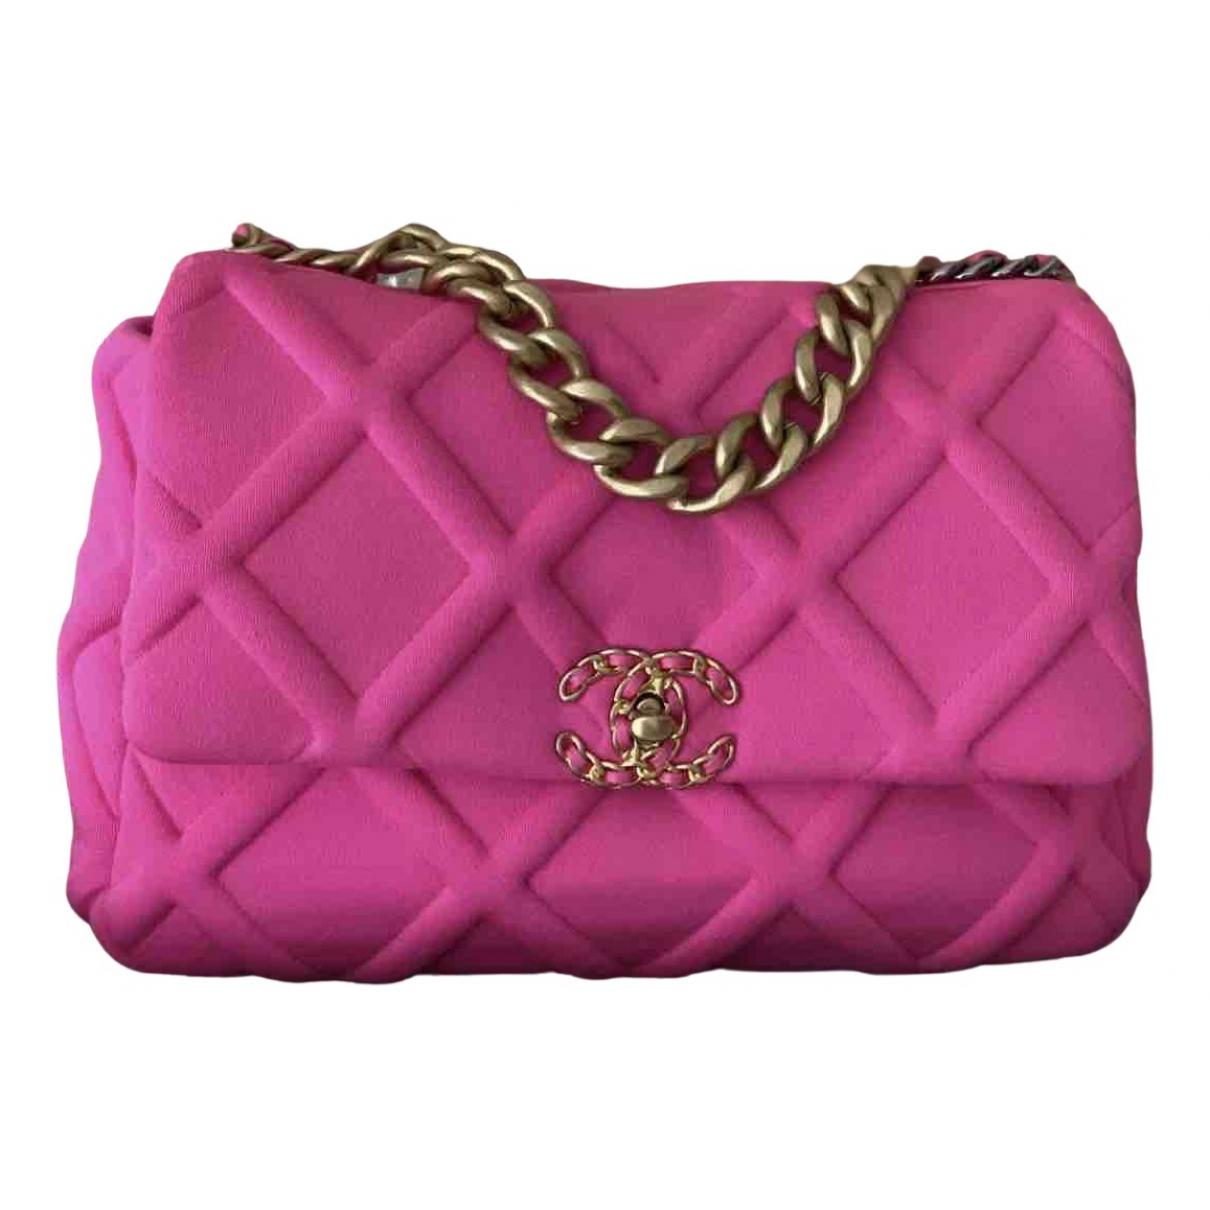 Chanel Chanel 19 Pink Cloth handbag for Women N